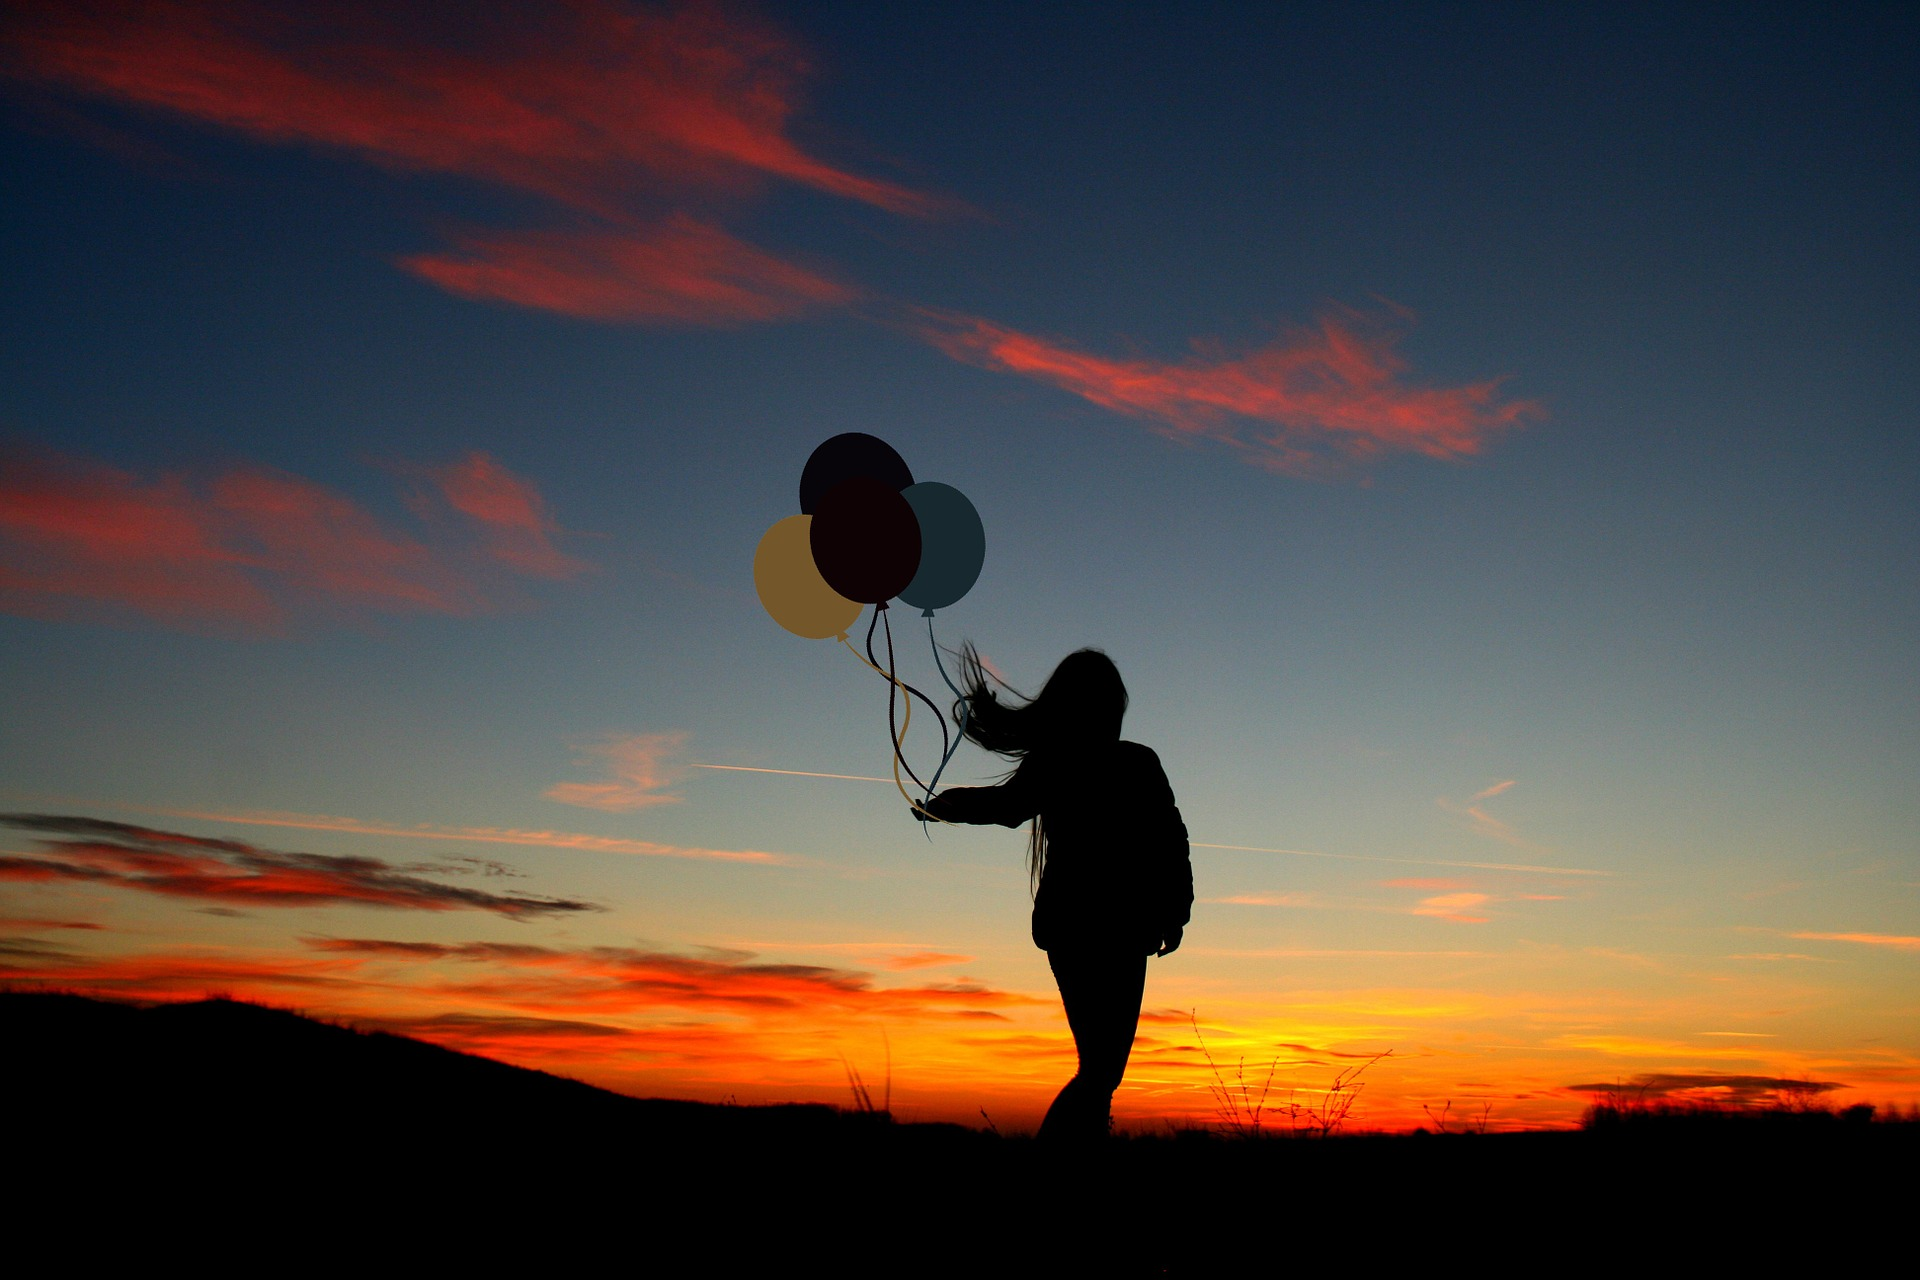 sunset-1112644_1920